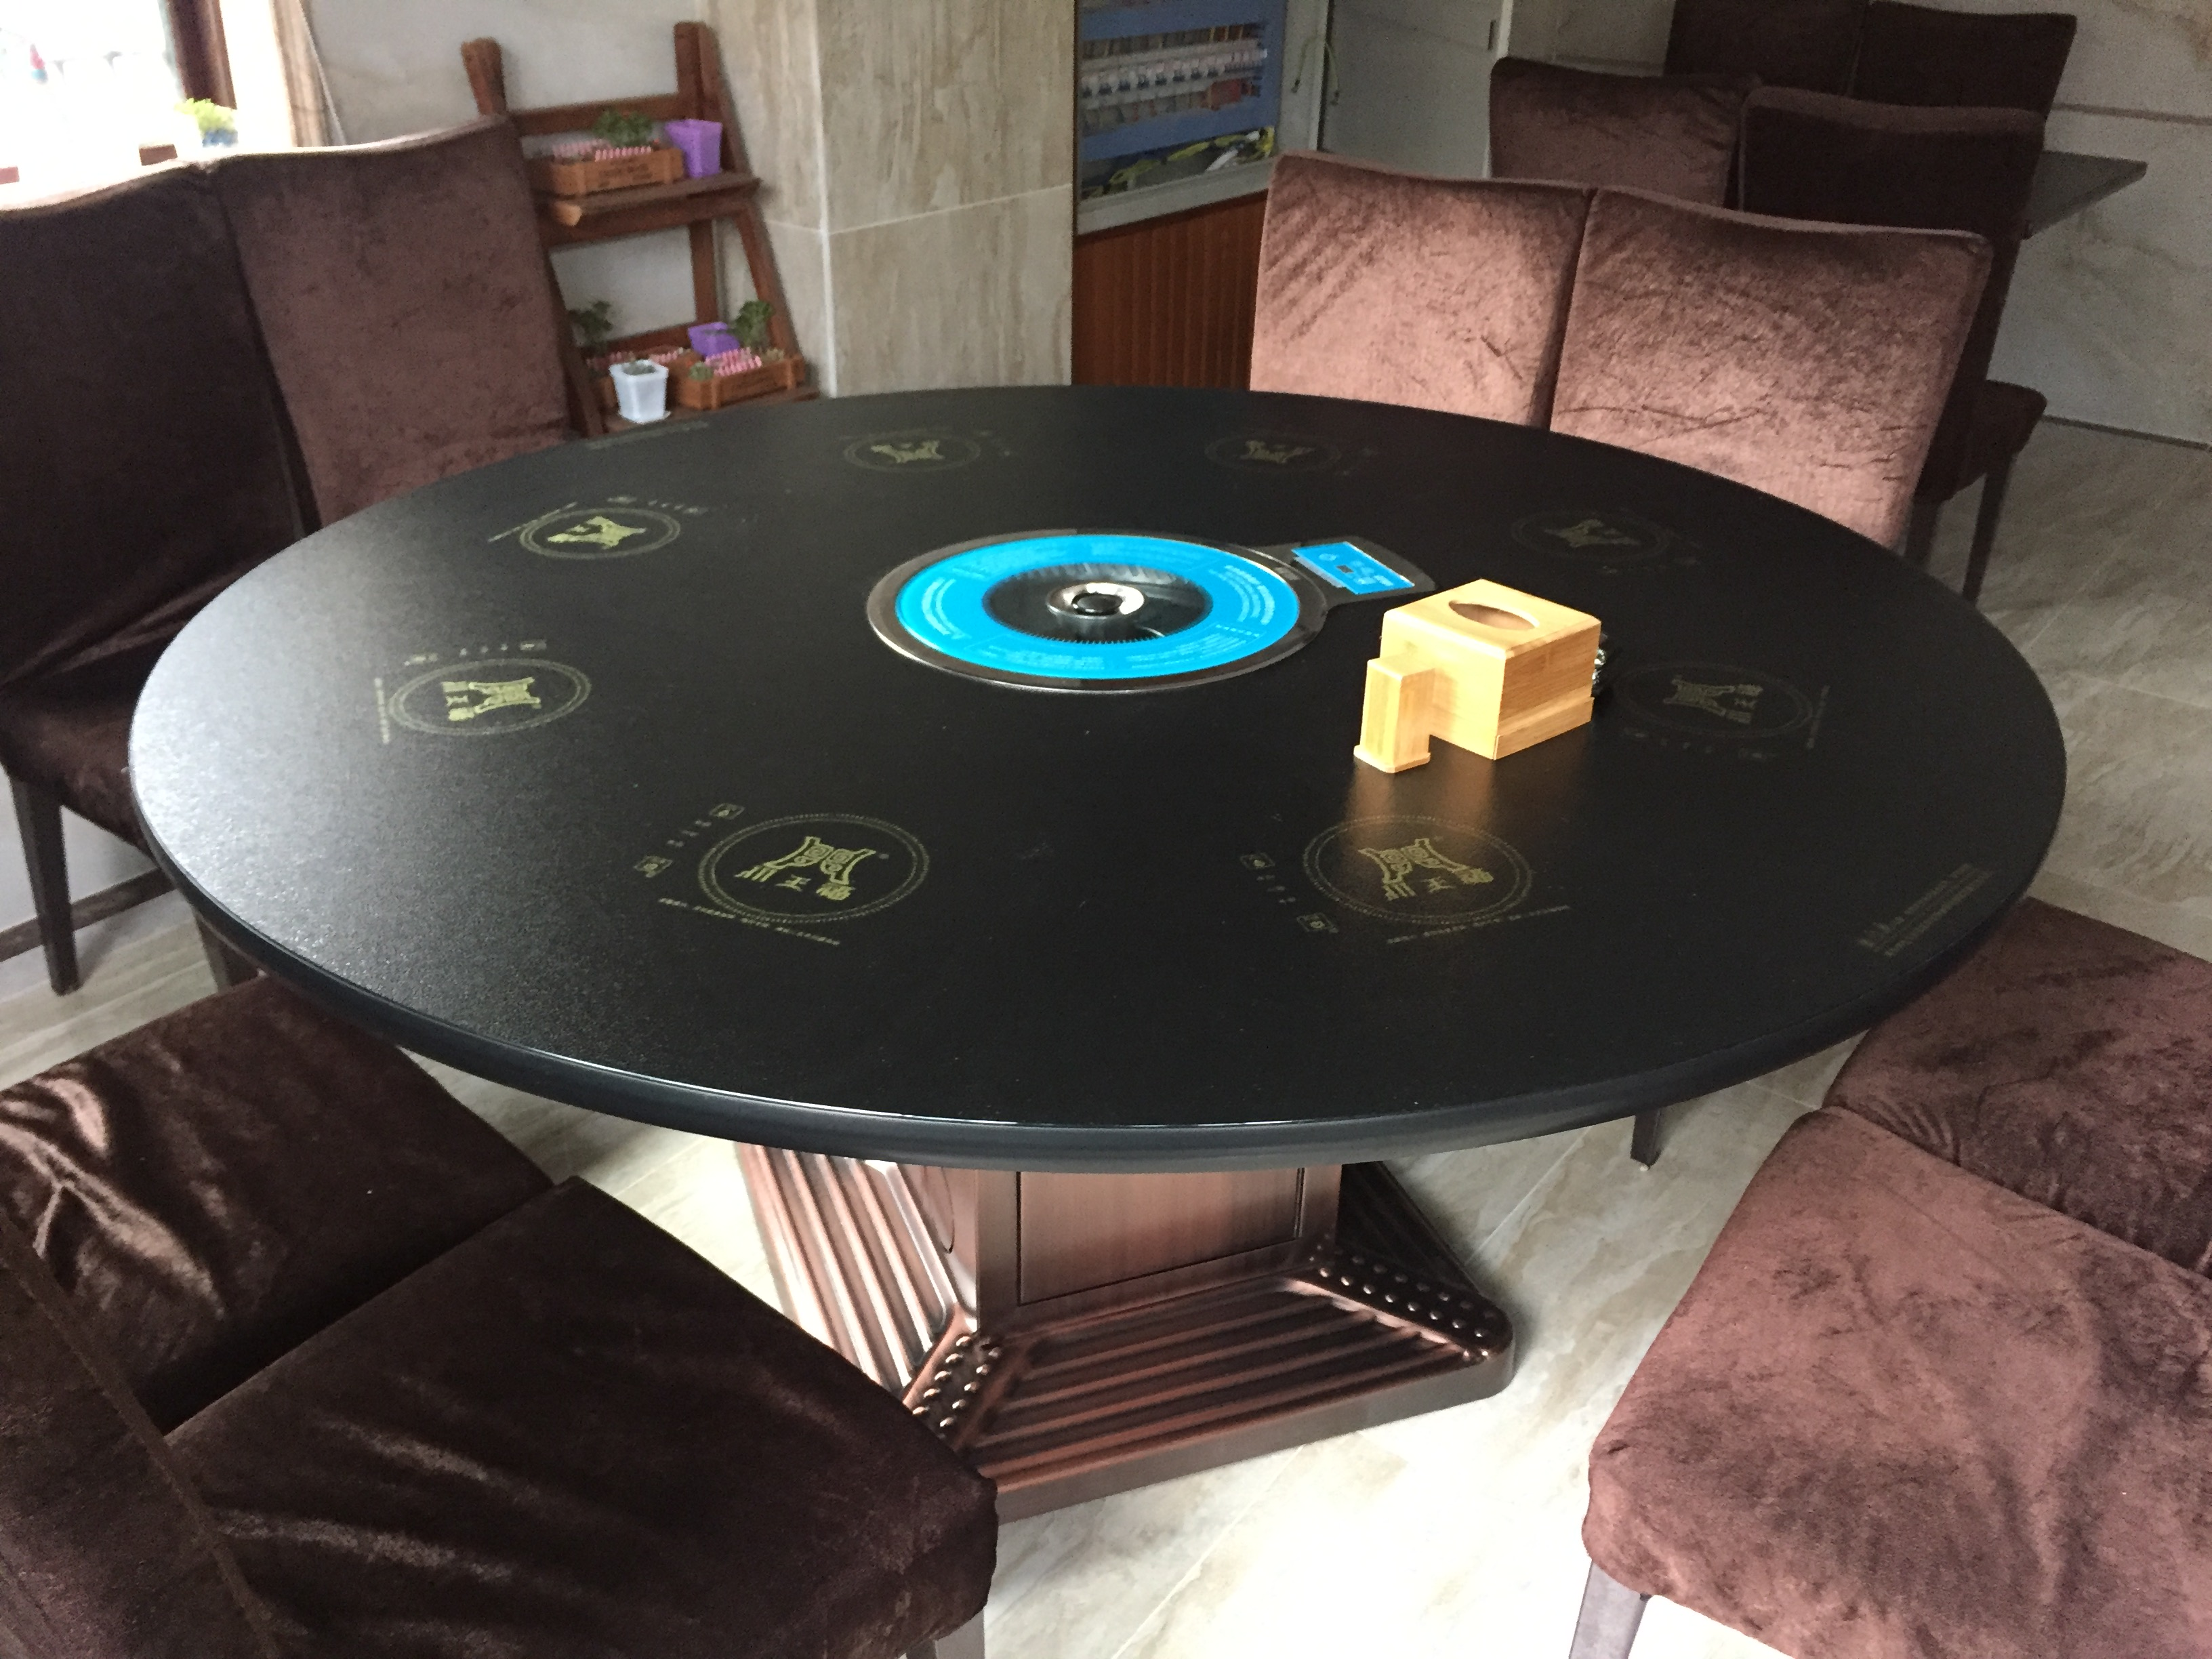 Z81防滑玻璃类似雷竞技这种靠谱的桌1.JPG